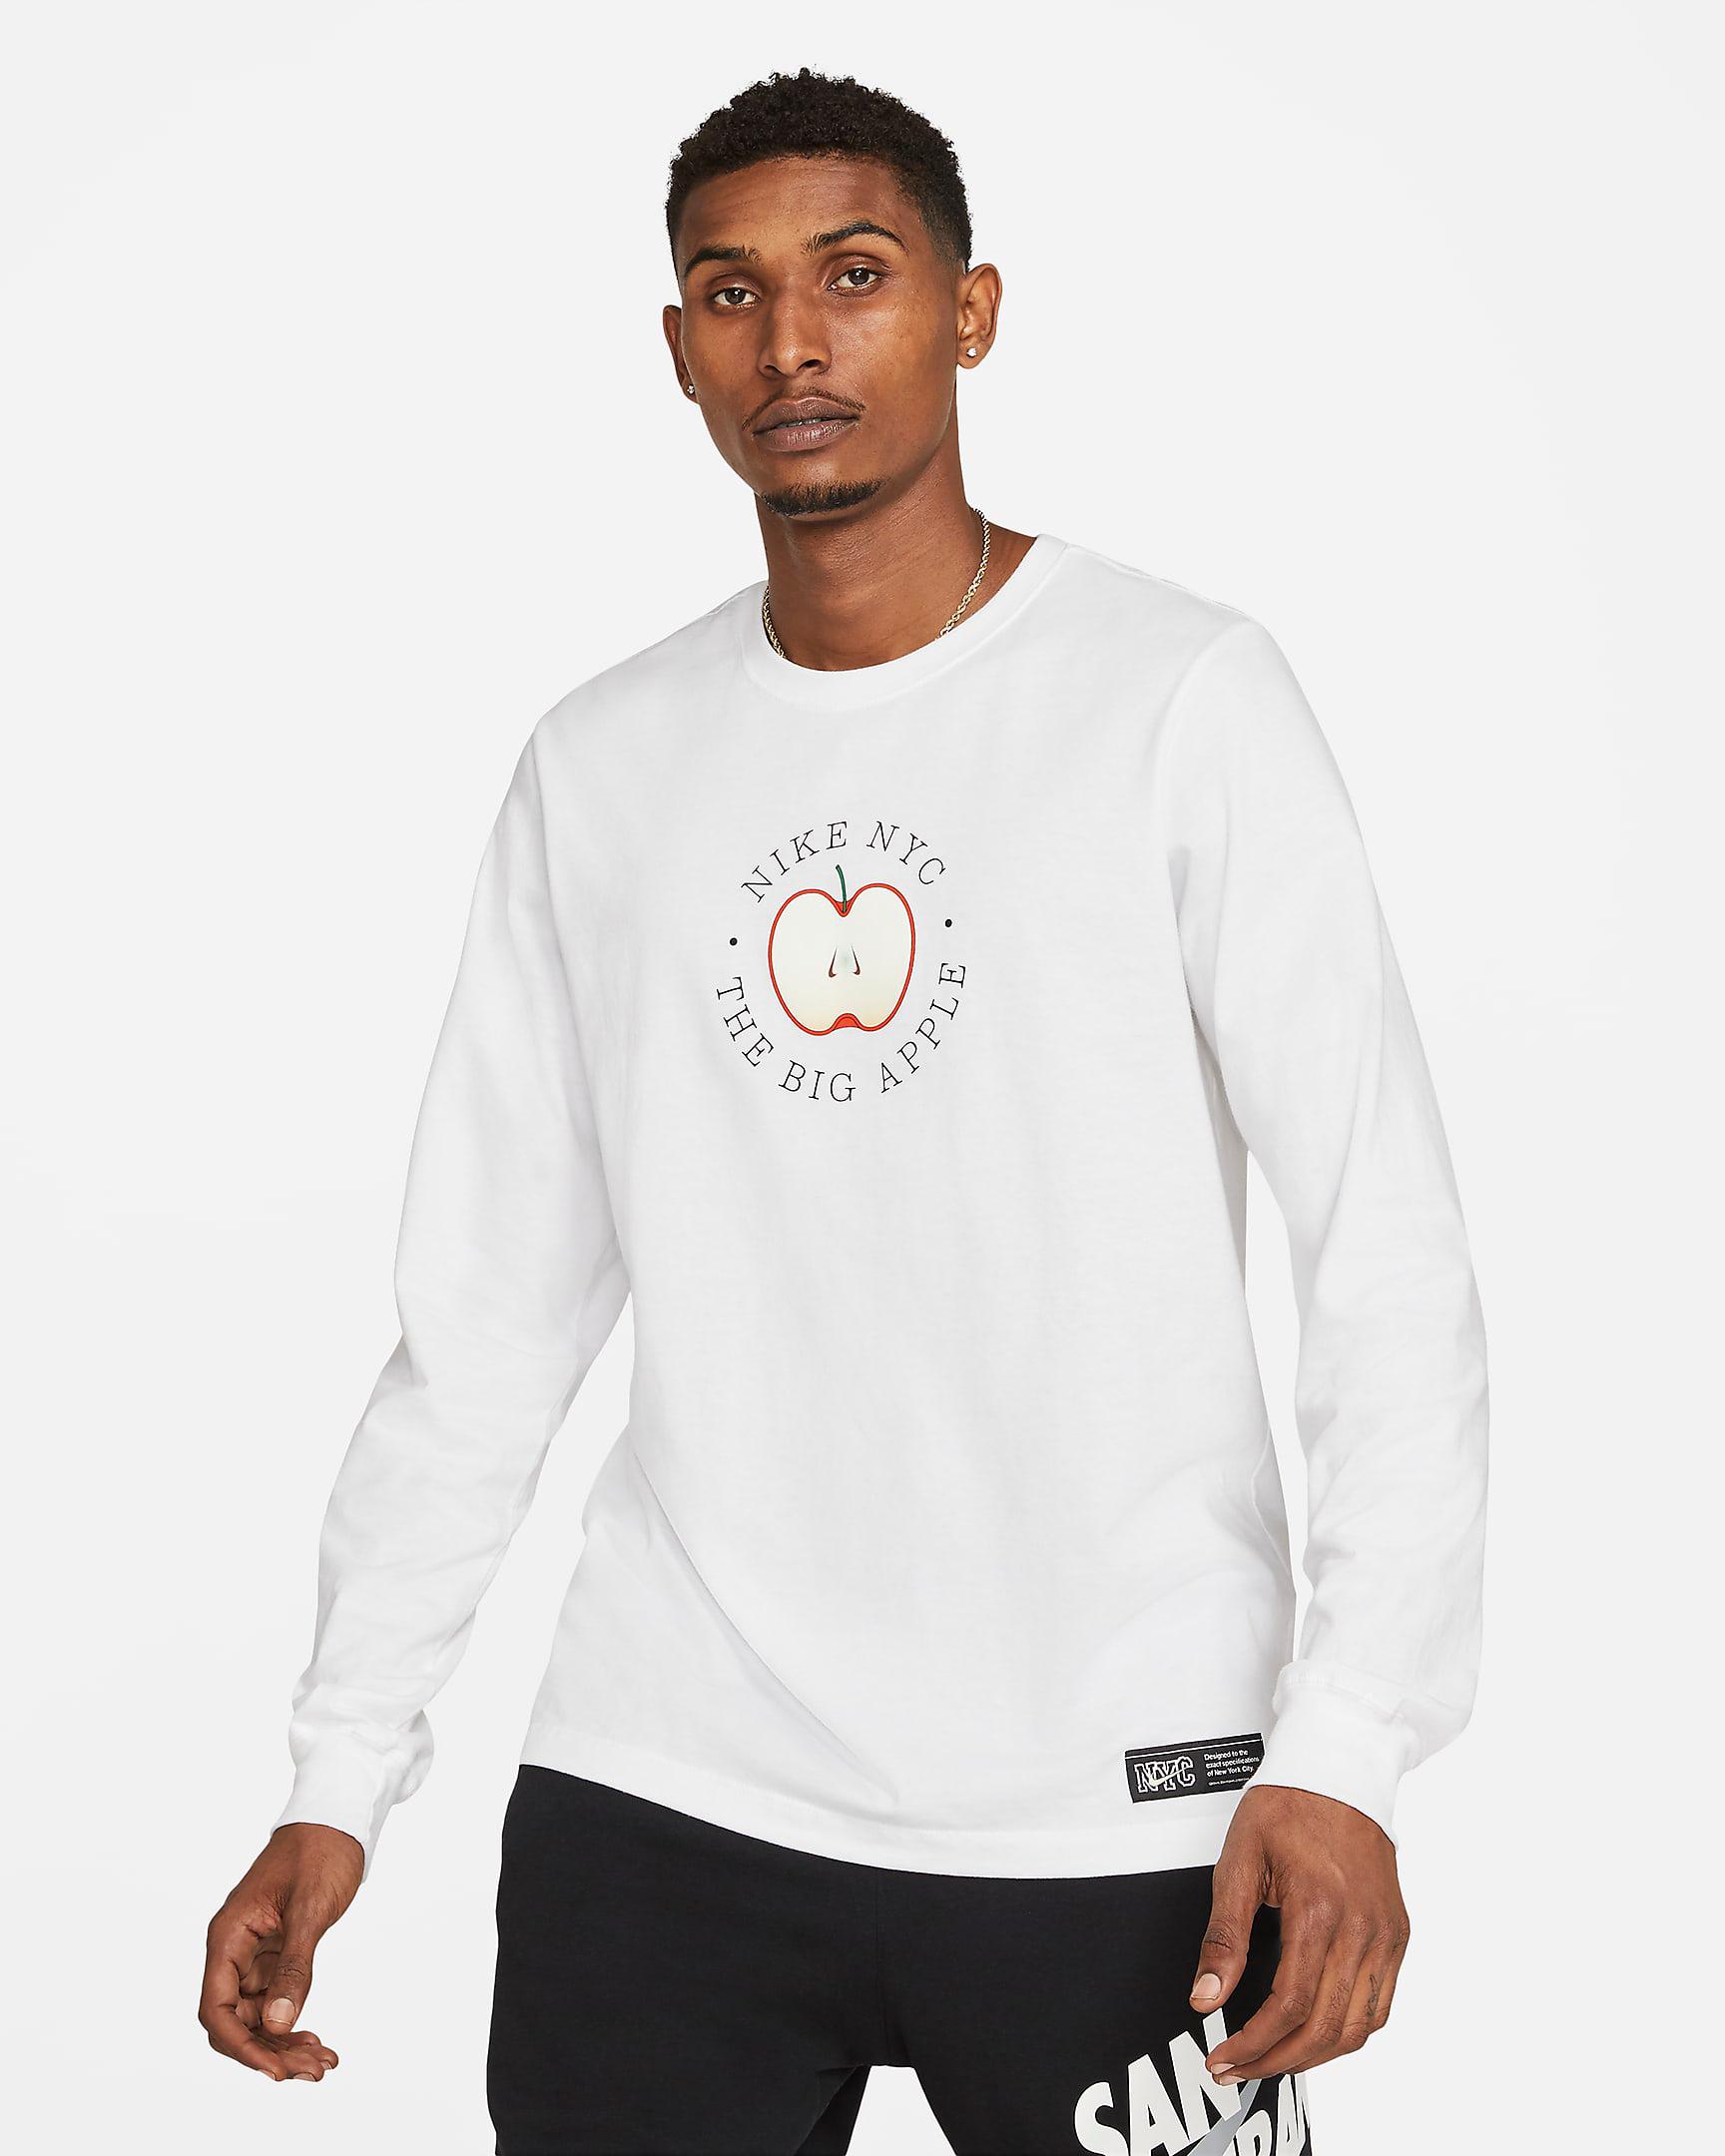 nike-sportswear-nyc-big-apple-shirt-1